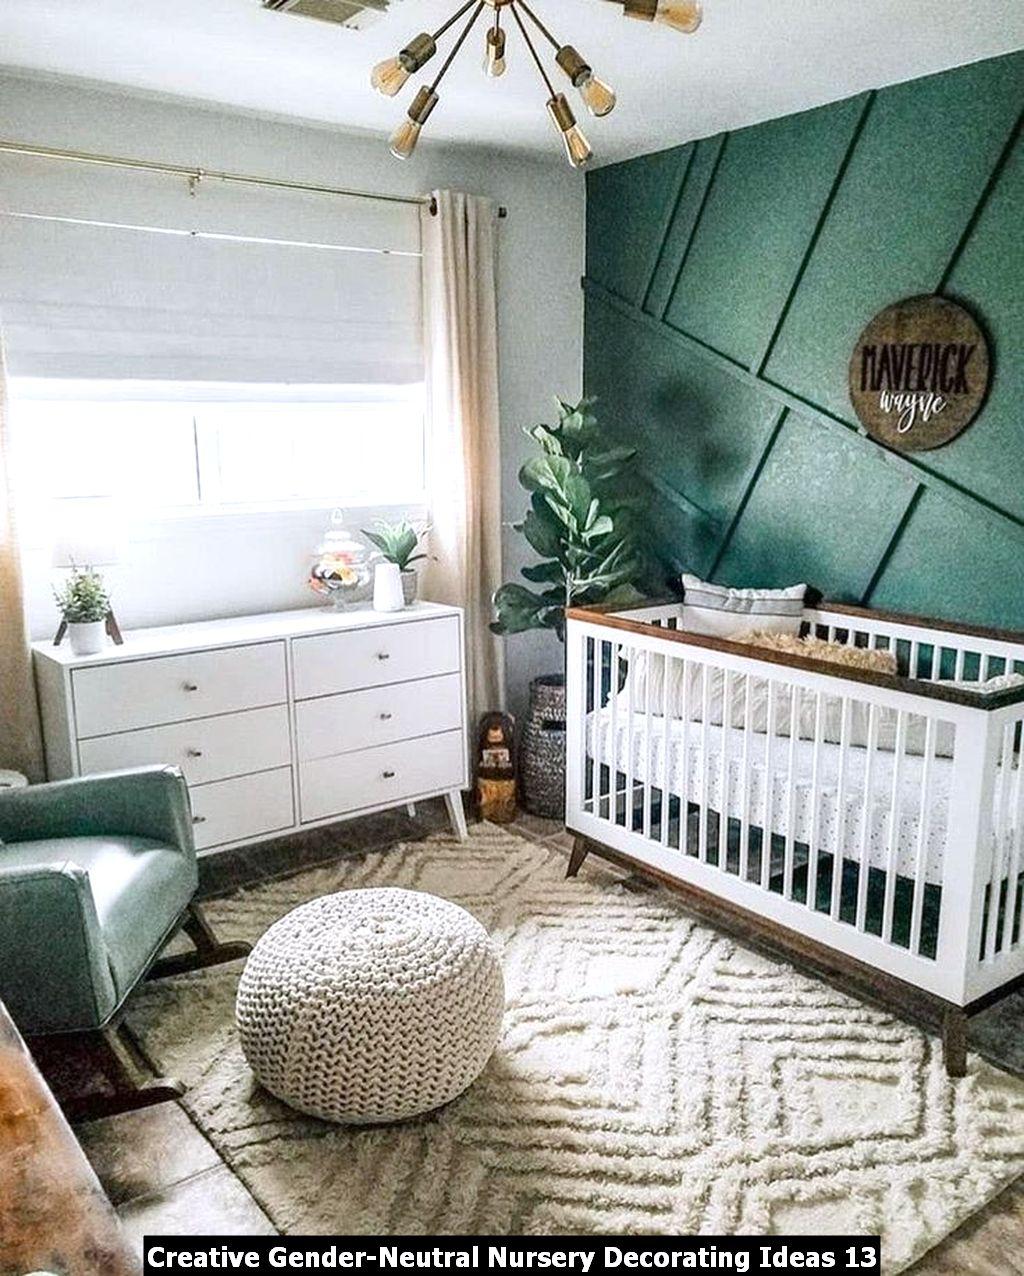 Creative Gender Neutral Nursery Decorating Ideas 13